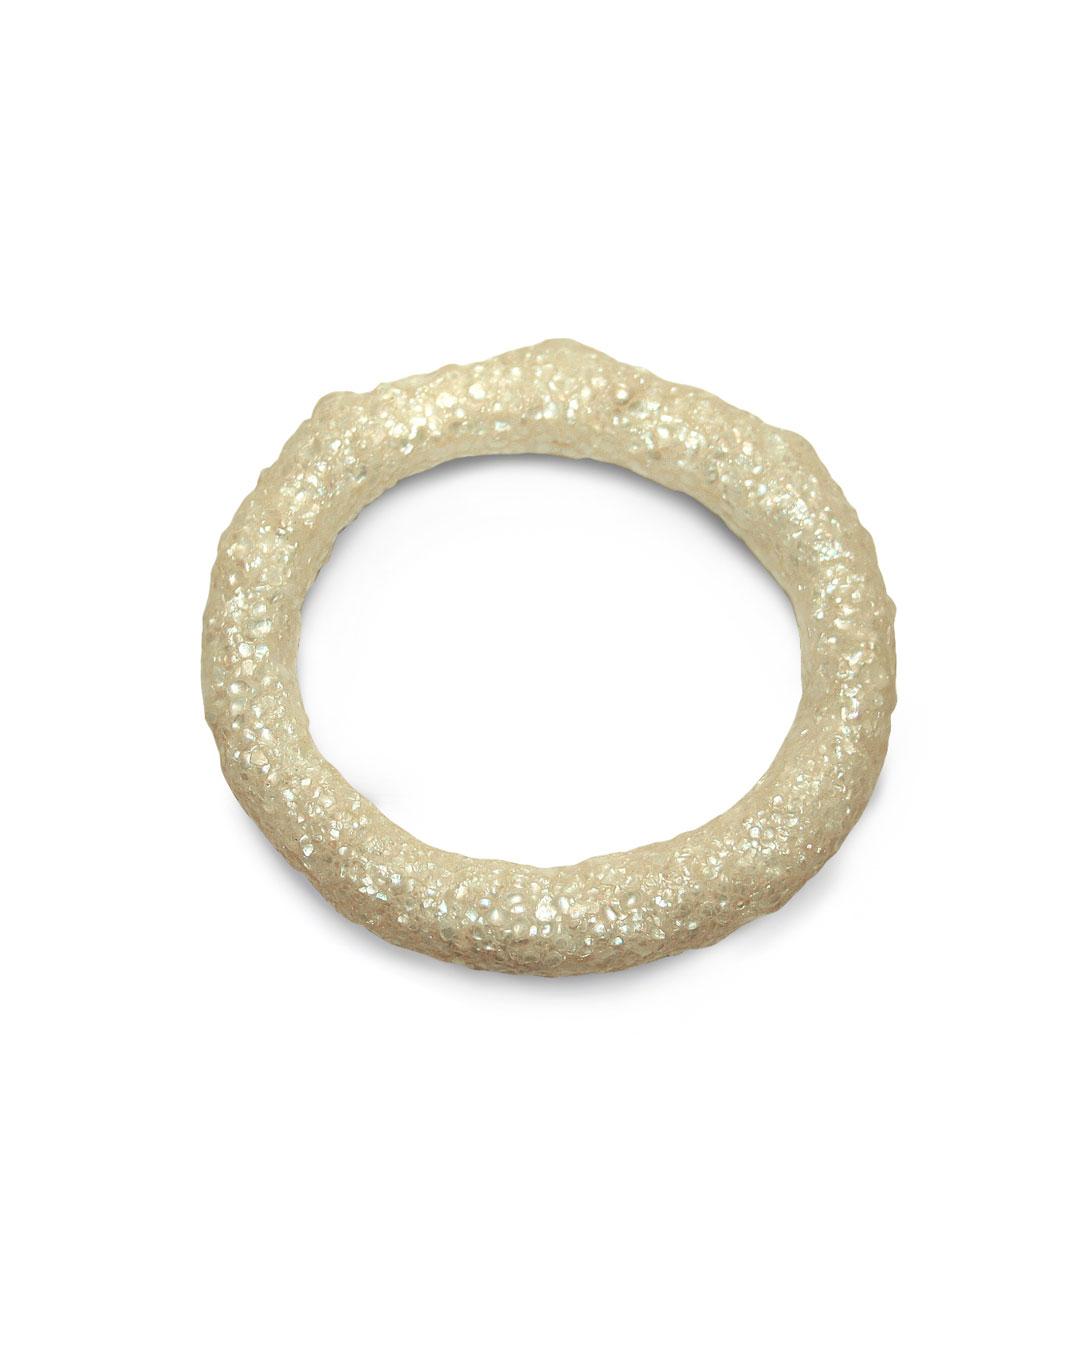 Carmen Hauser, Perlenreif, 2015, bracelet; pearls, resin, 90 x 85 x 14 mm, €730